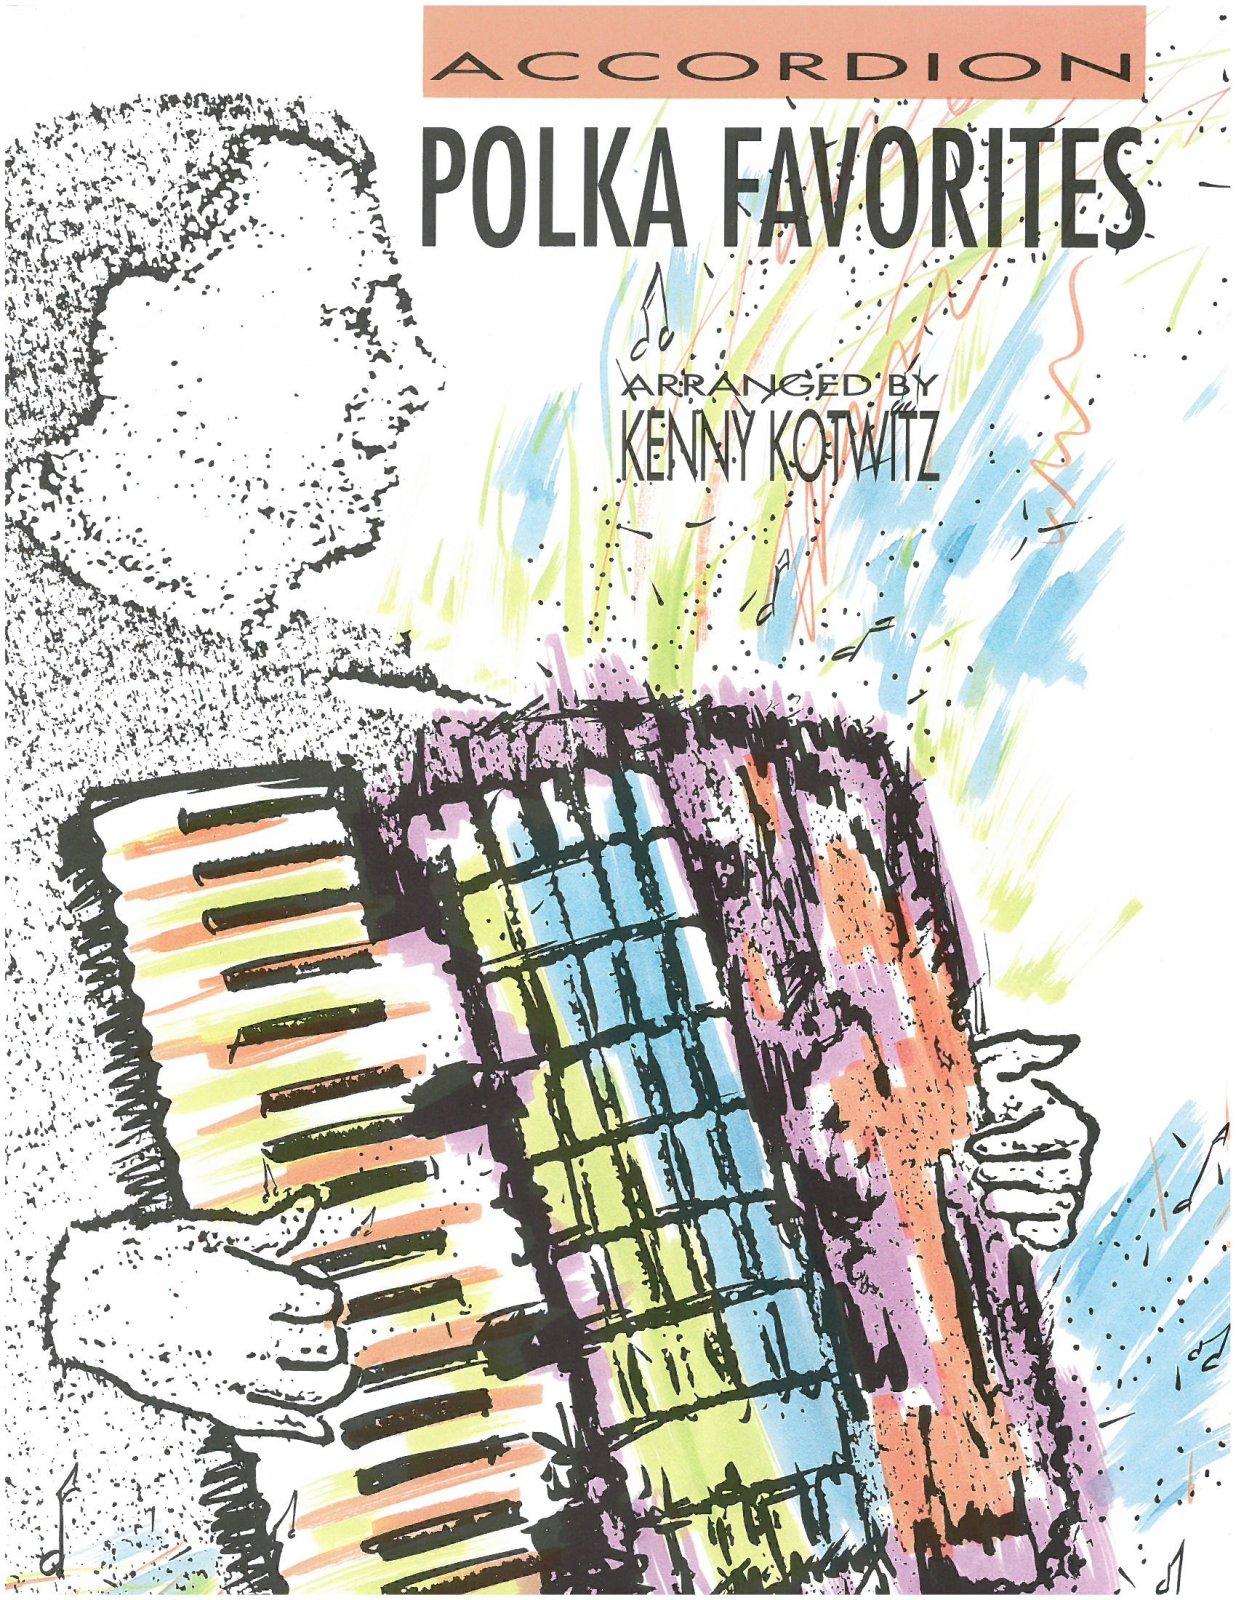 Accordion Polka Favorites